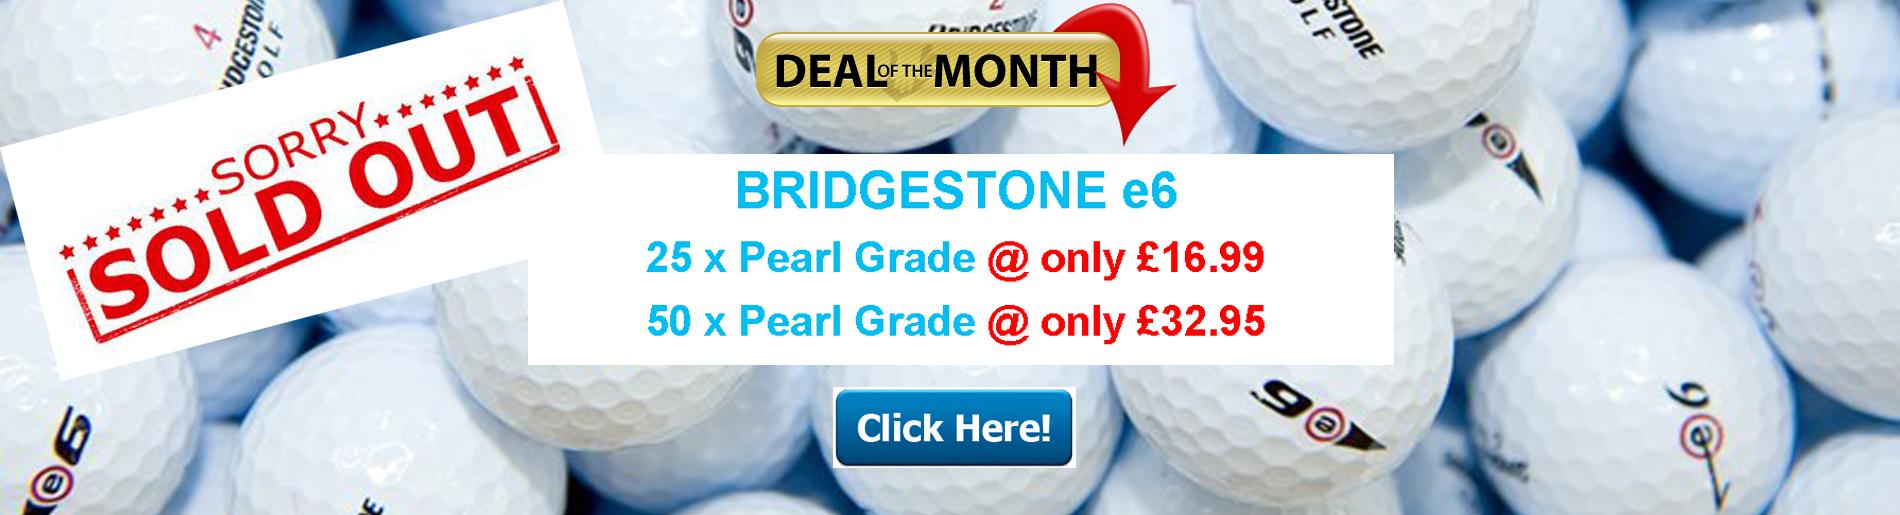 Bridgestone e6 Deal of the Month